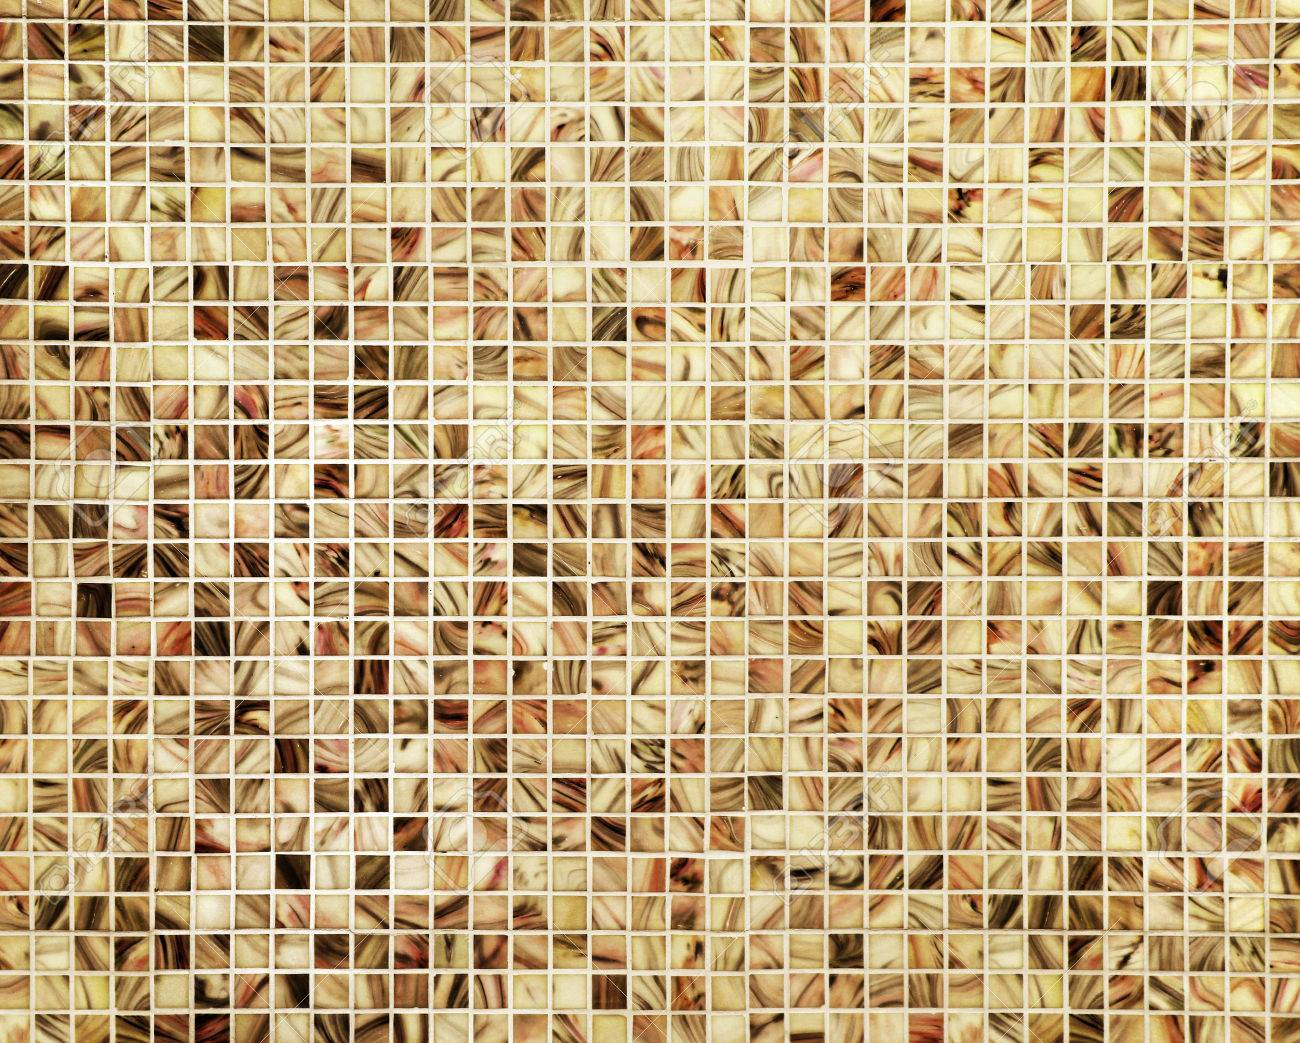 Marble mosaic floor tiles geometric decoration background stock marble mosaic floor tiles geometric decoration background stock photo 22224291 dailygadgetfo Choice Image